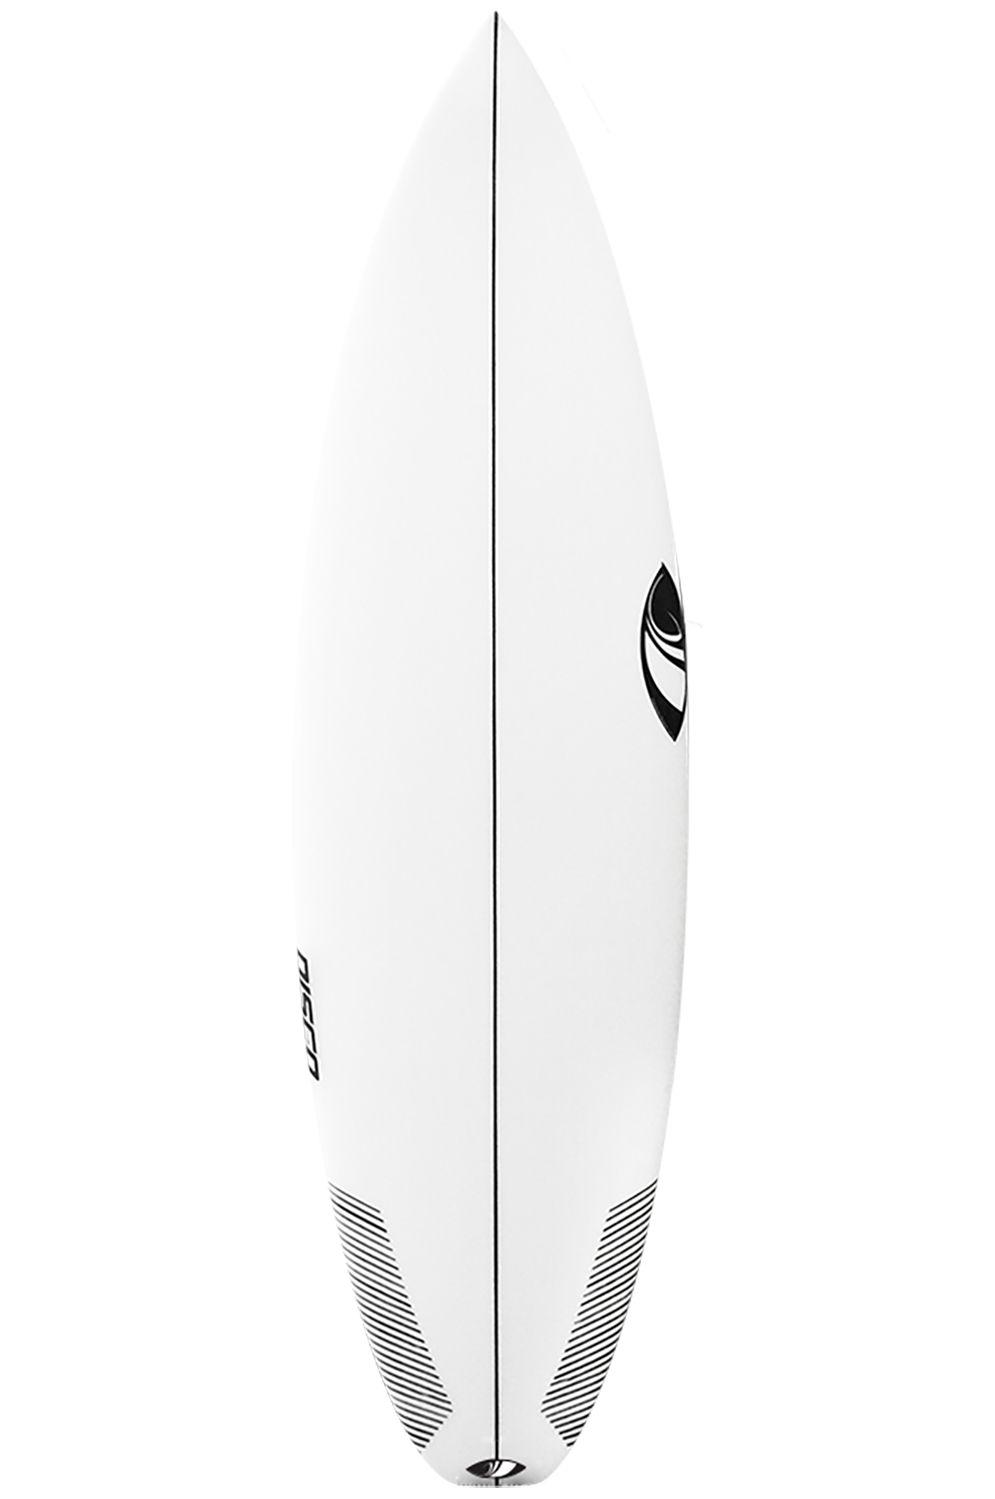 Sharpeye Surf Board 5'10 DISCO Squash Tail - White FCS II 5ft10